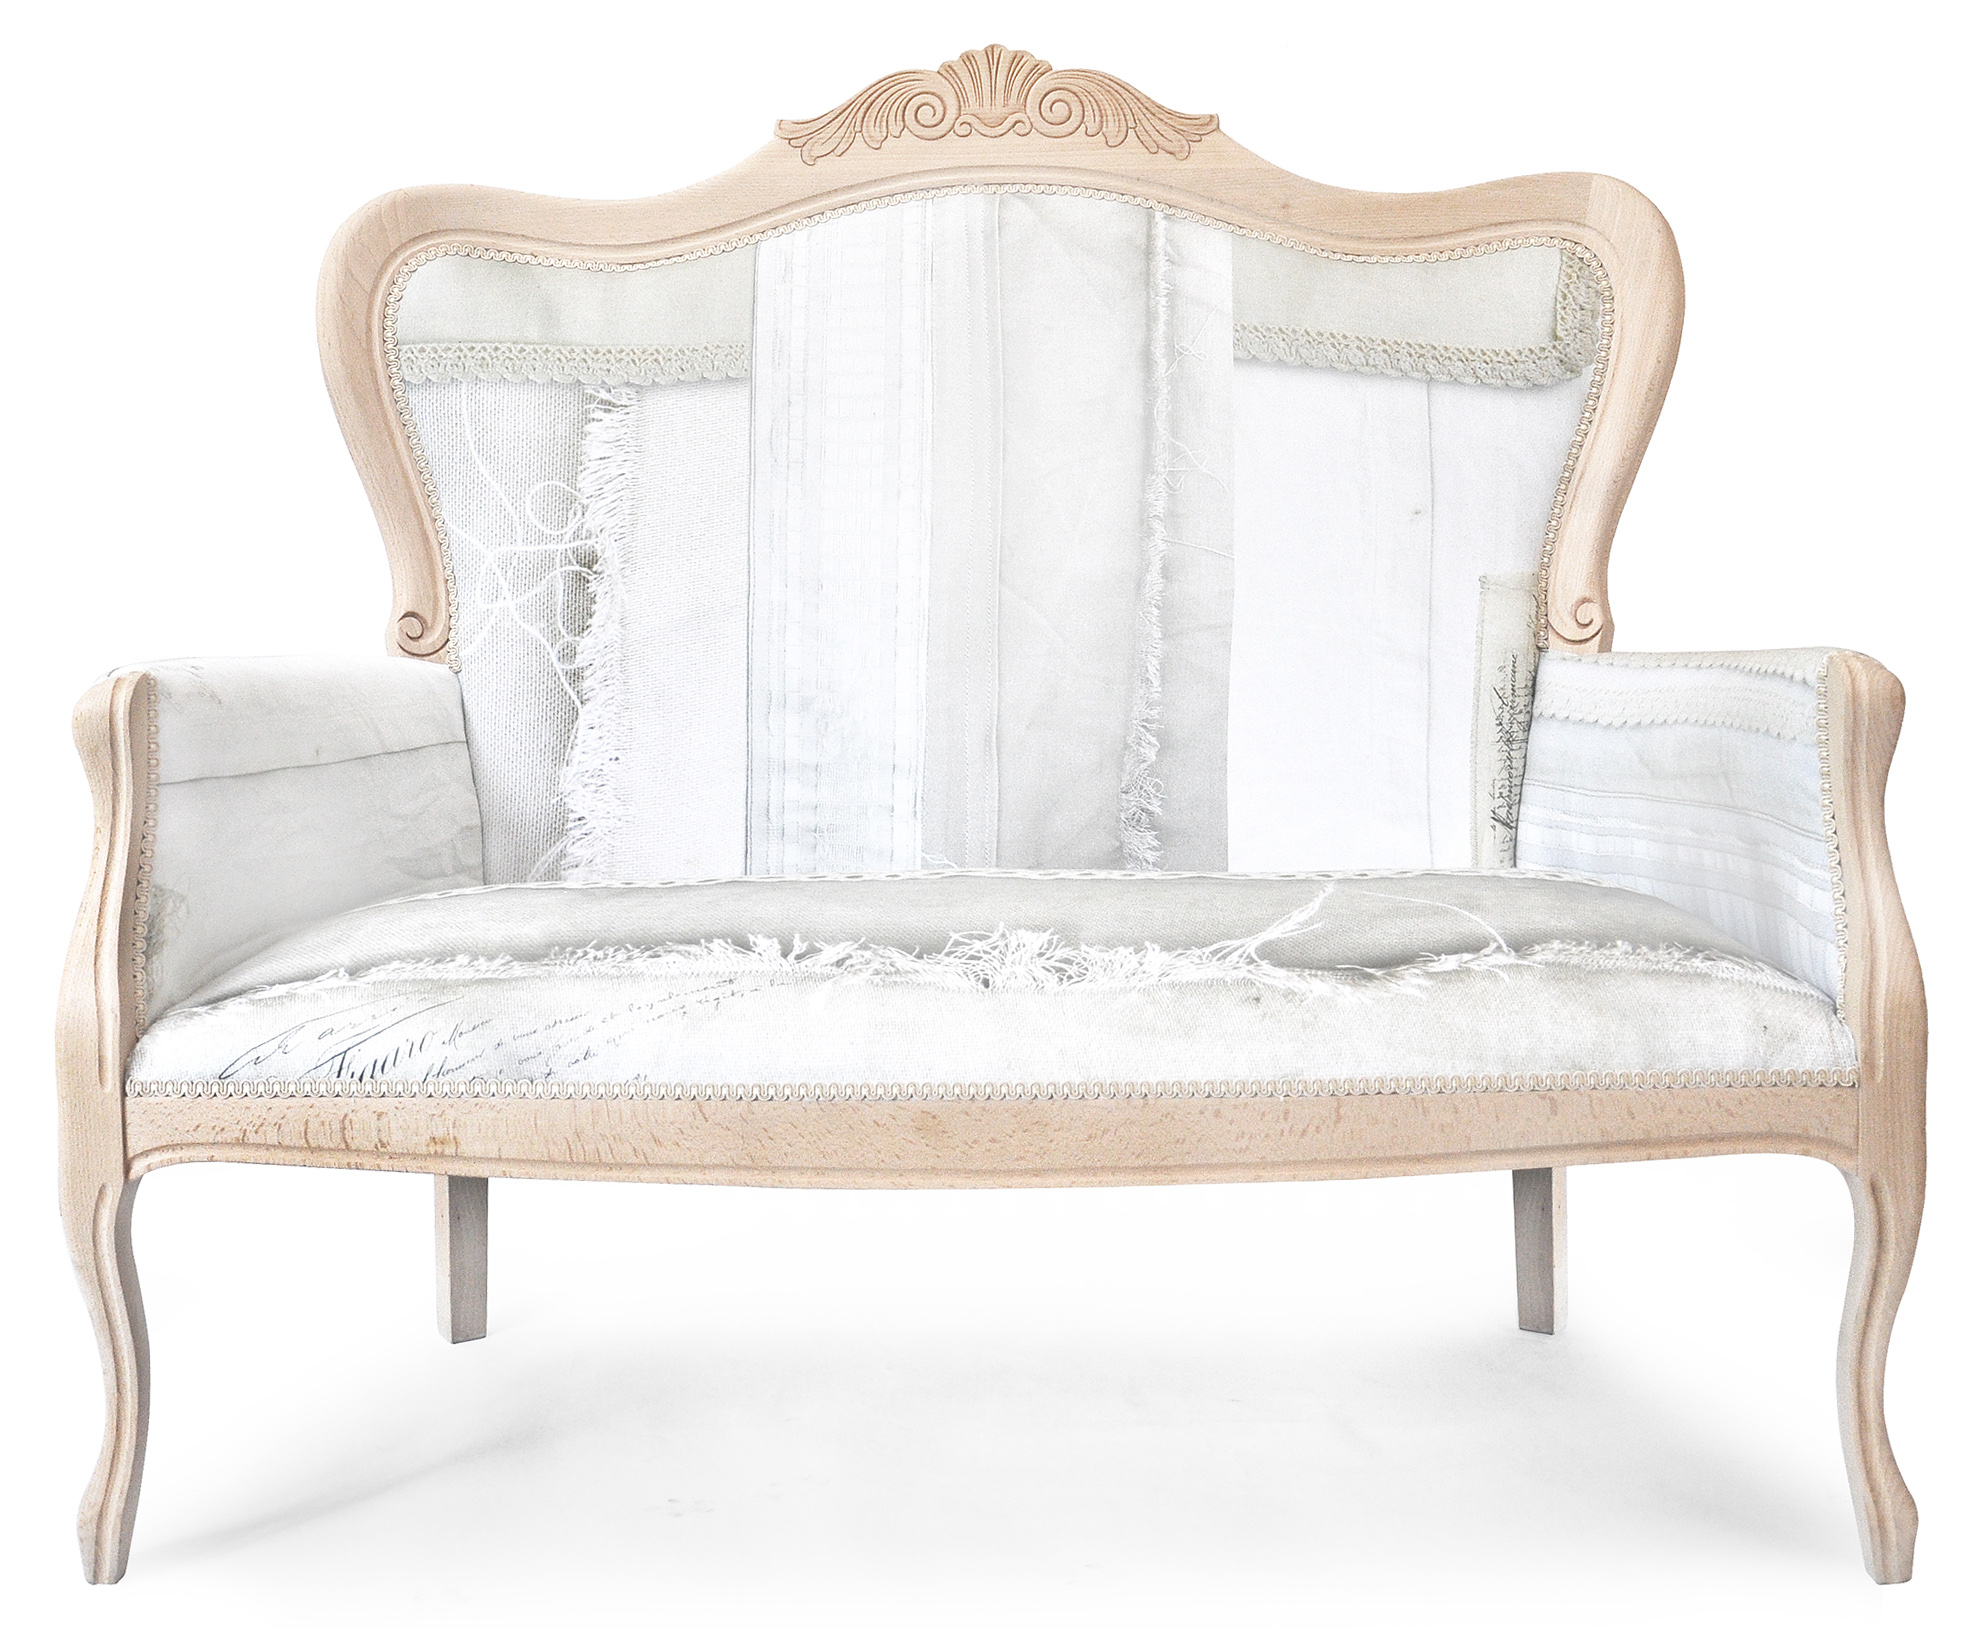 Shabby Chic soffa